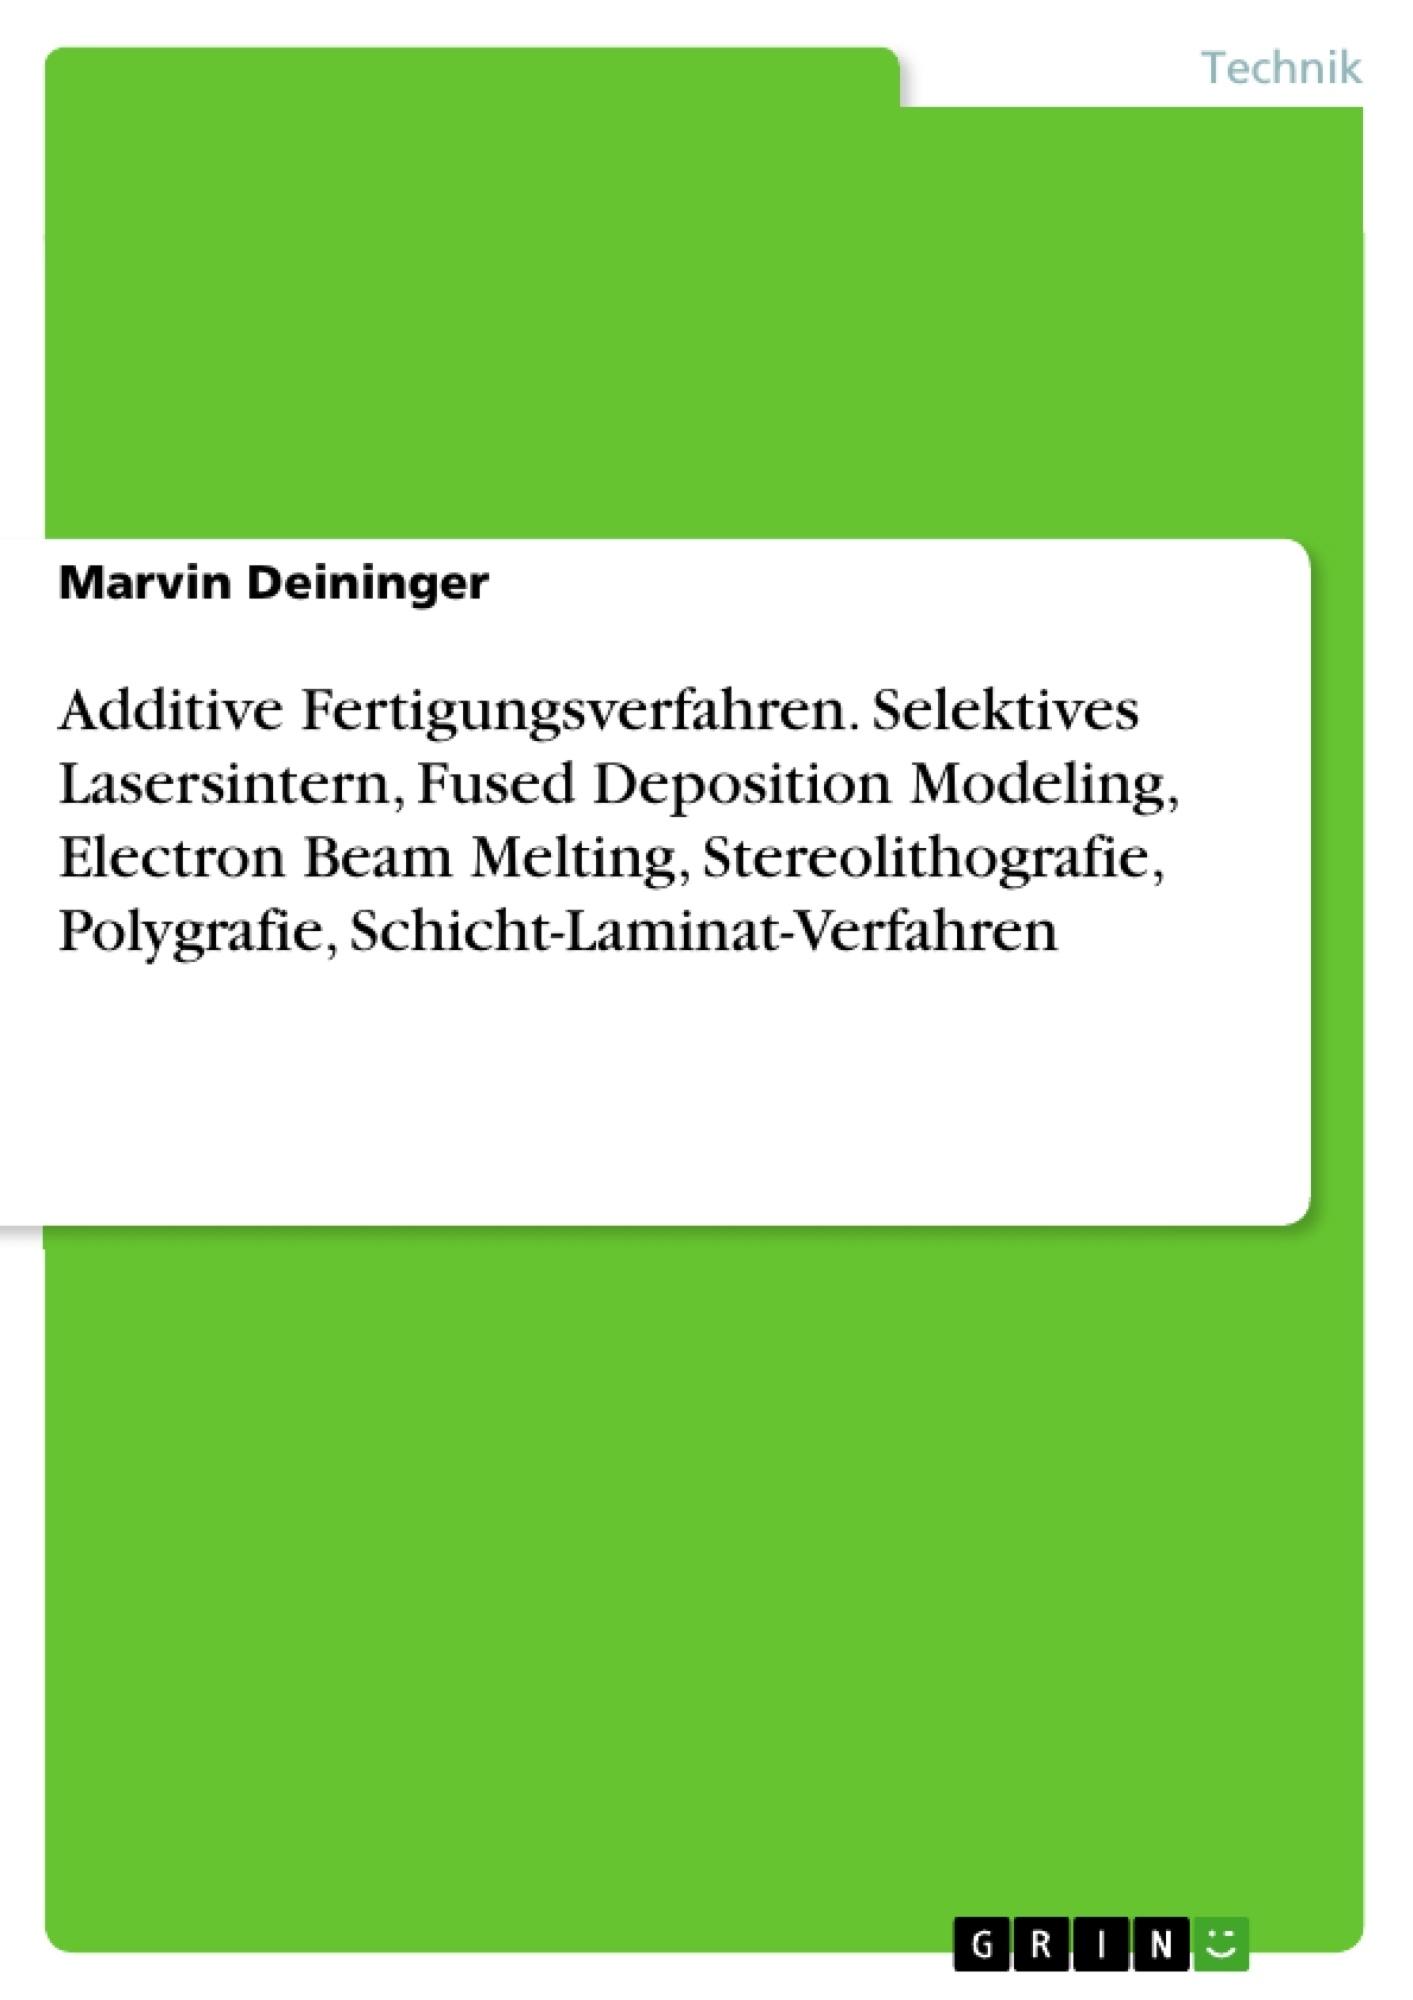 Titel: Additive Fertigungsverfahren. Selektives Lasersintern, Fused Deposition Modeling, Electron Beam Melting, Stereolithografie, Polygrafie, Schicht-Laminat-Verfahren